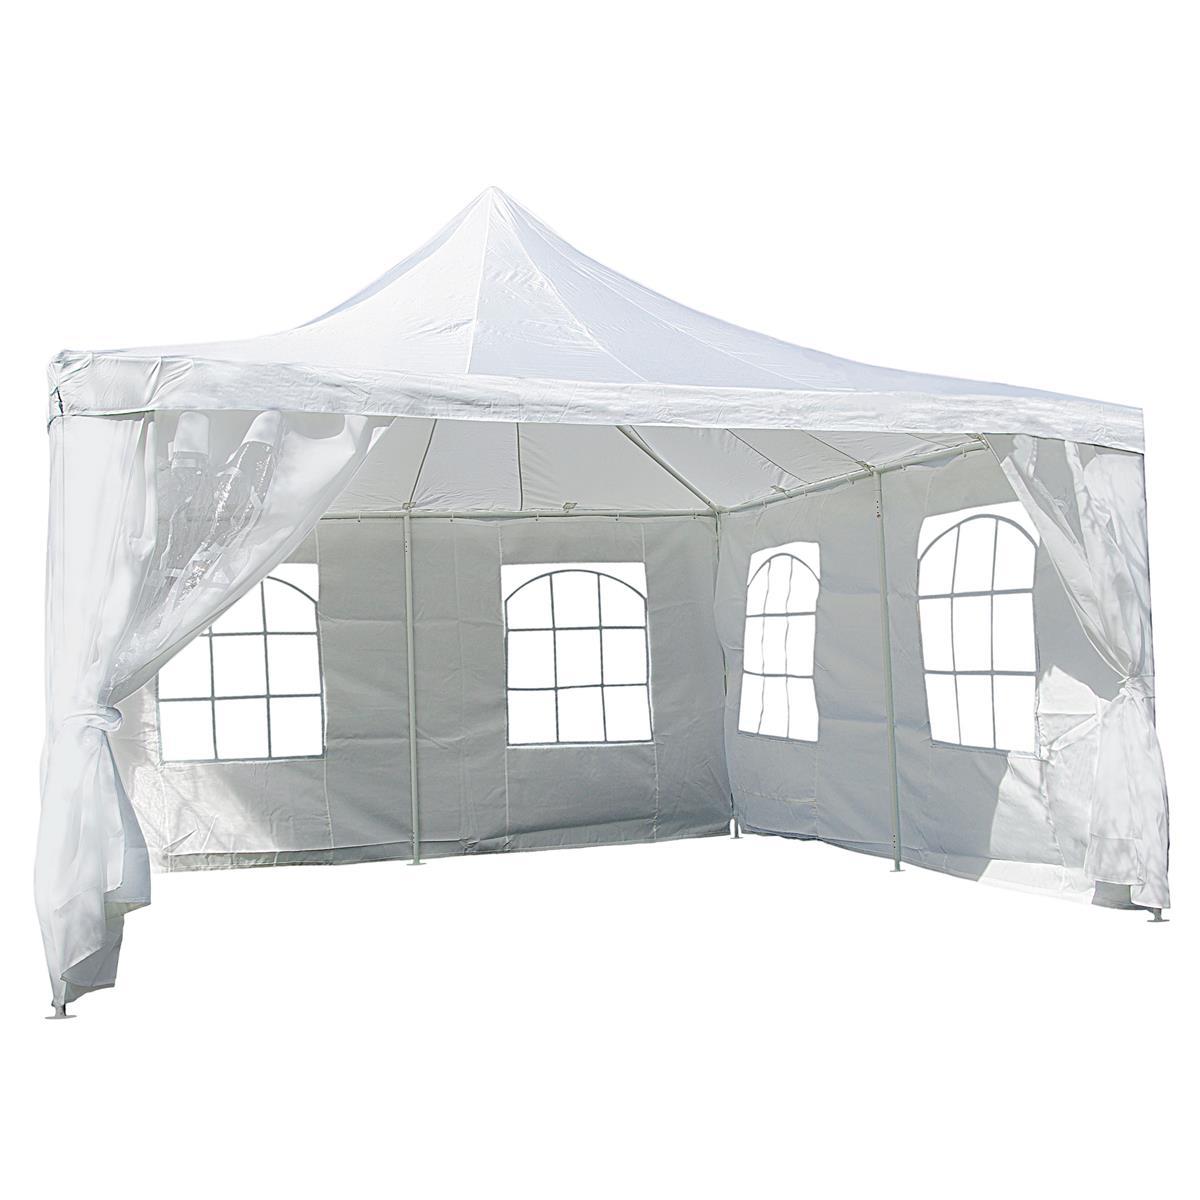 Partyzelt Pavillon Zelt Festzelt creme 4x 4m Polyester Dach wasserdicht 250 g/m²